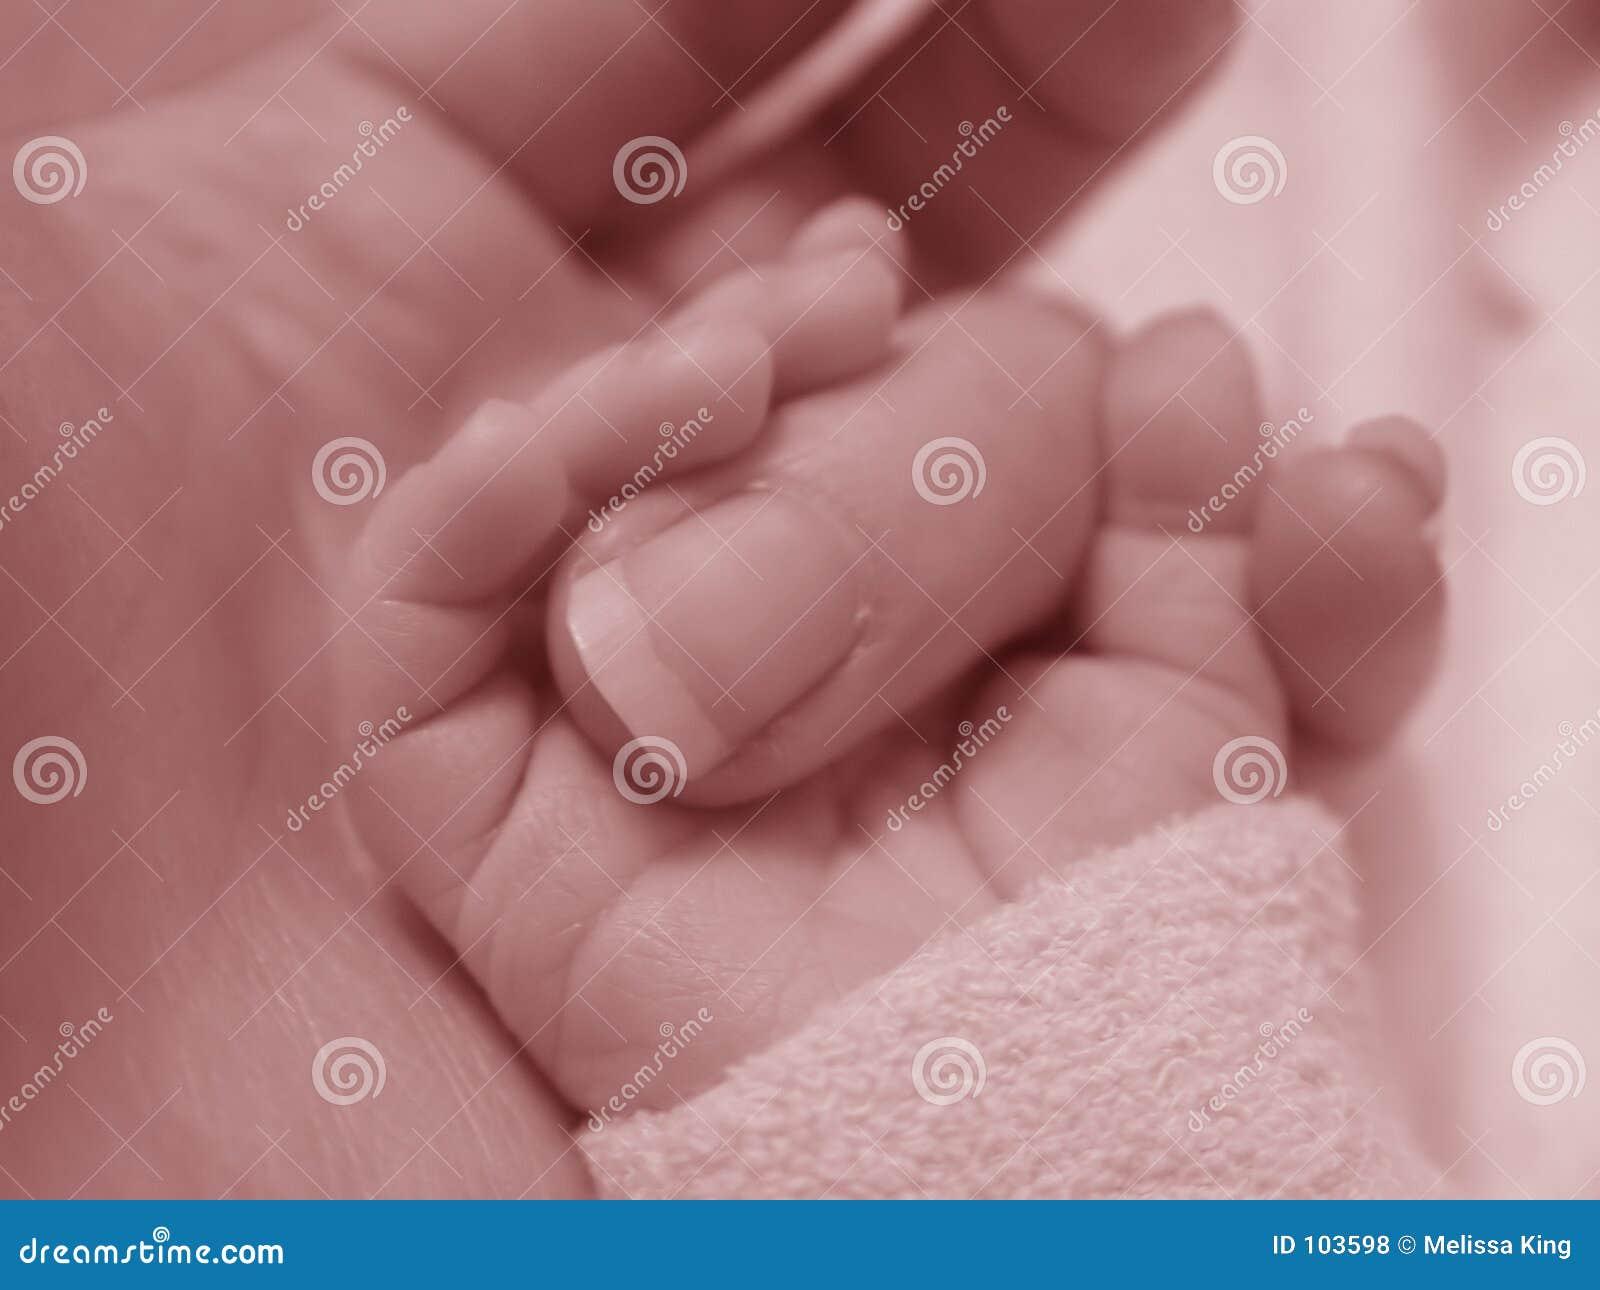 Baby Holding Finger Royalty Free Stock Photos Image 103598